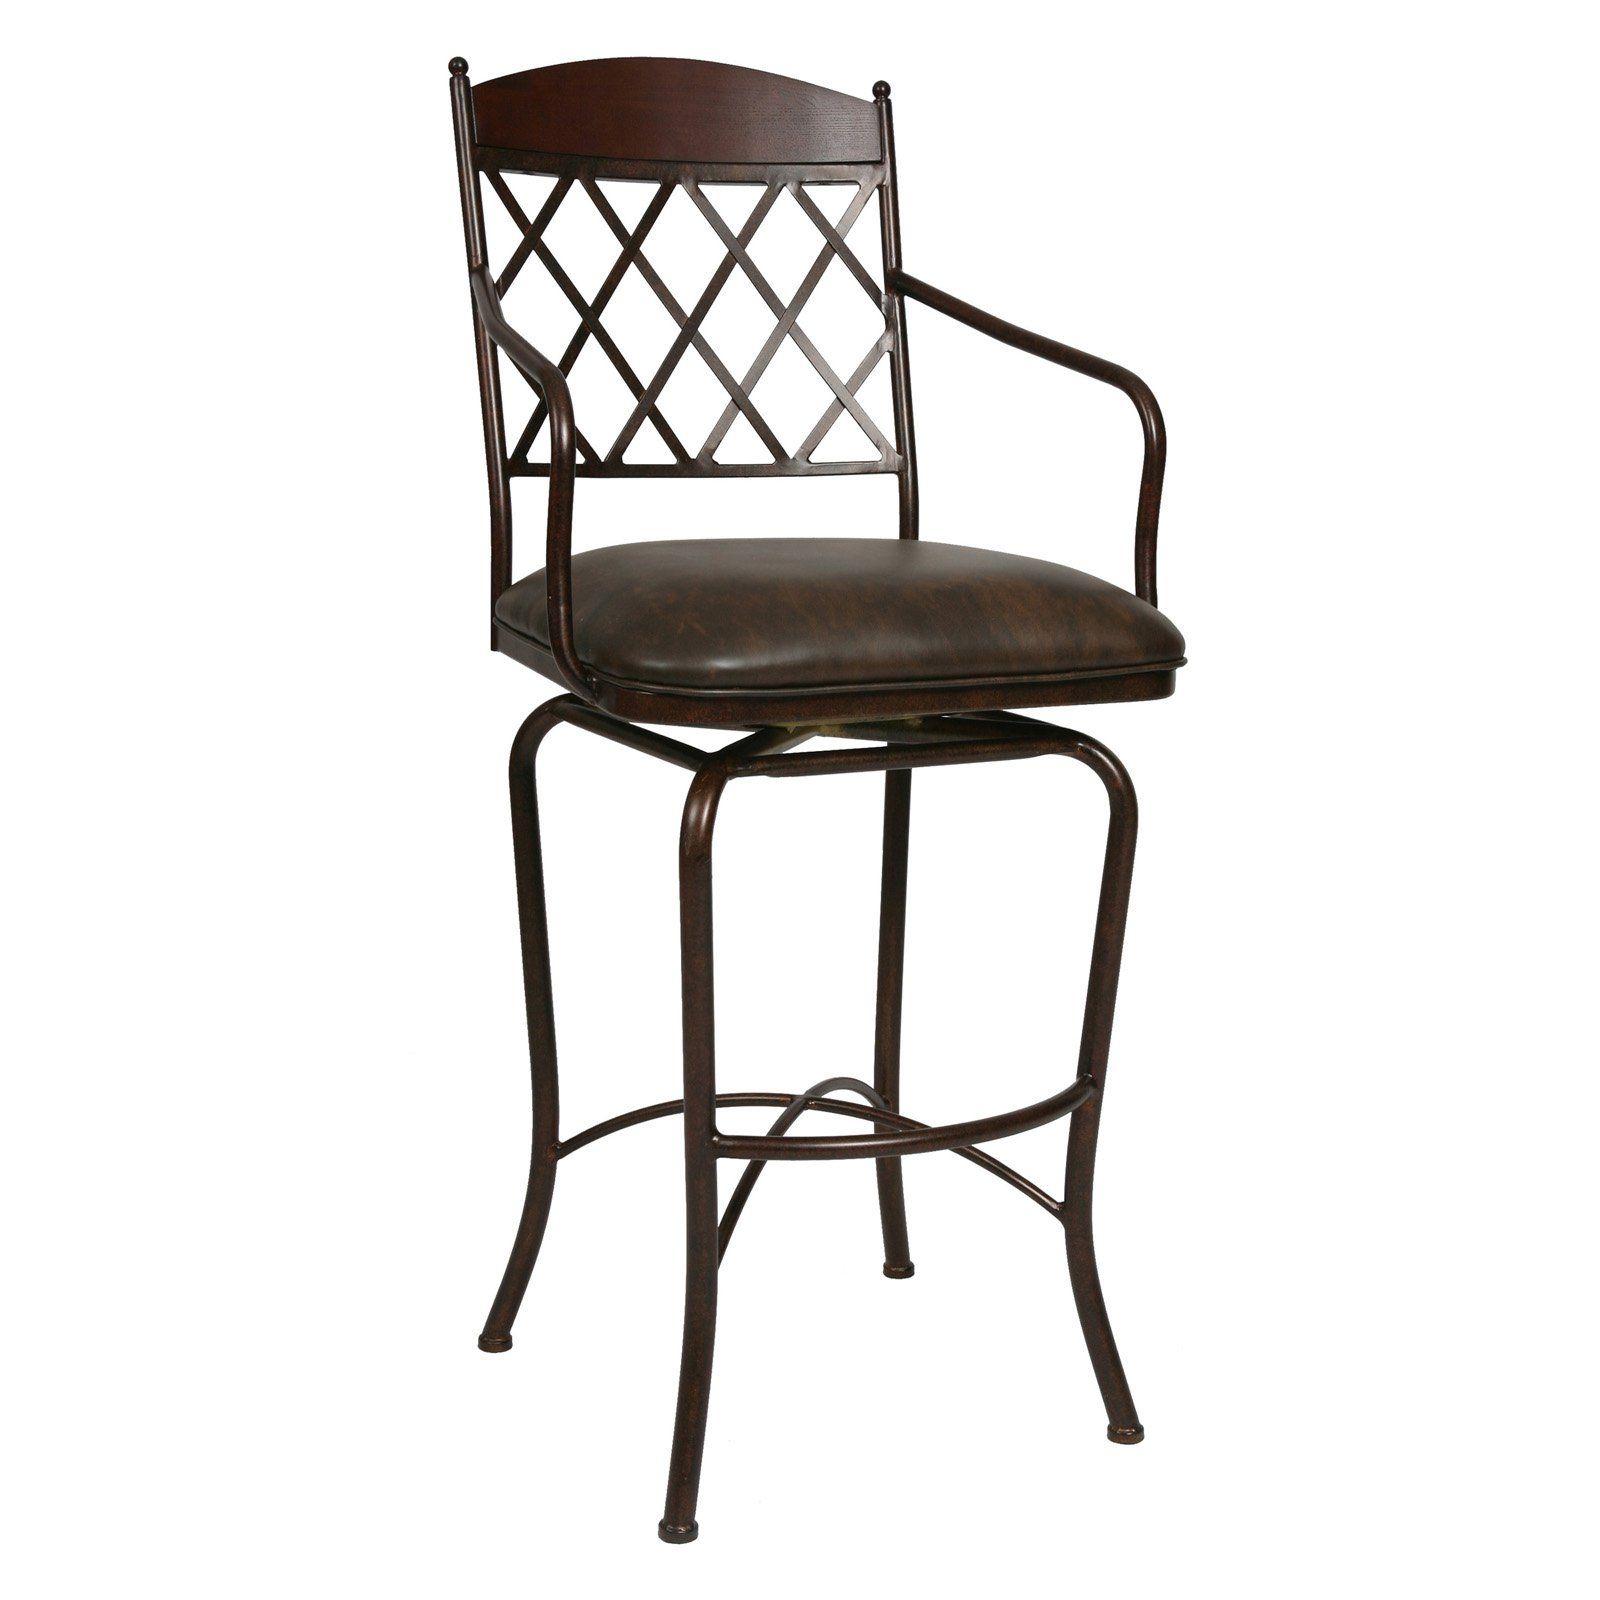 Ashley Furniture Flagstaff: Impacterra 26-in. Napa Ridge Swivel Counter Stool With